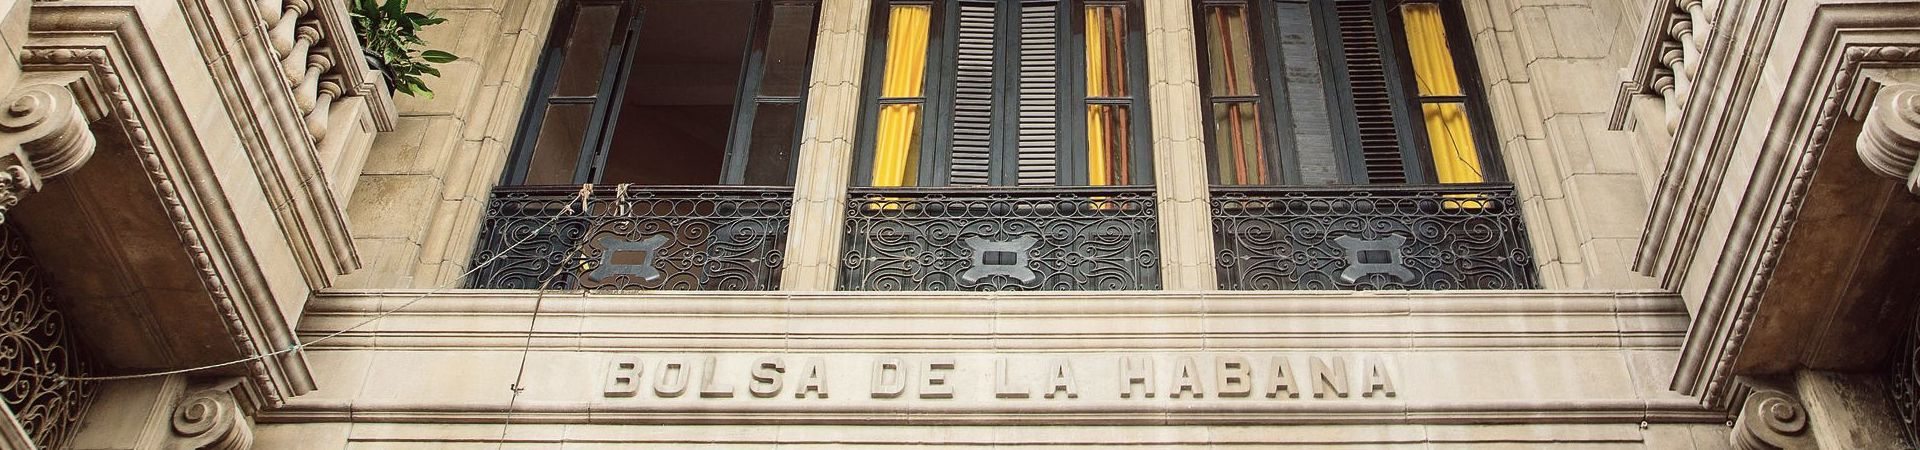 Havane musées